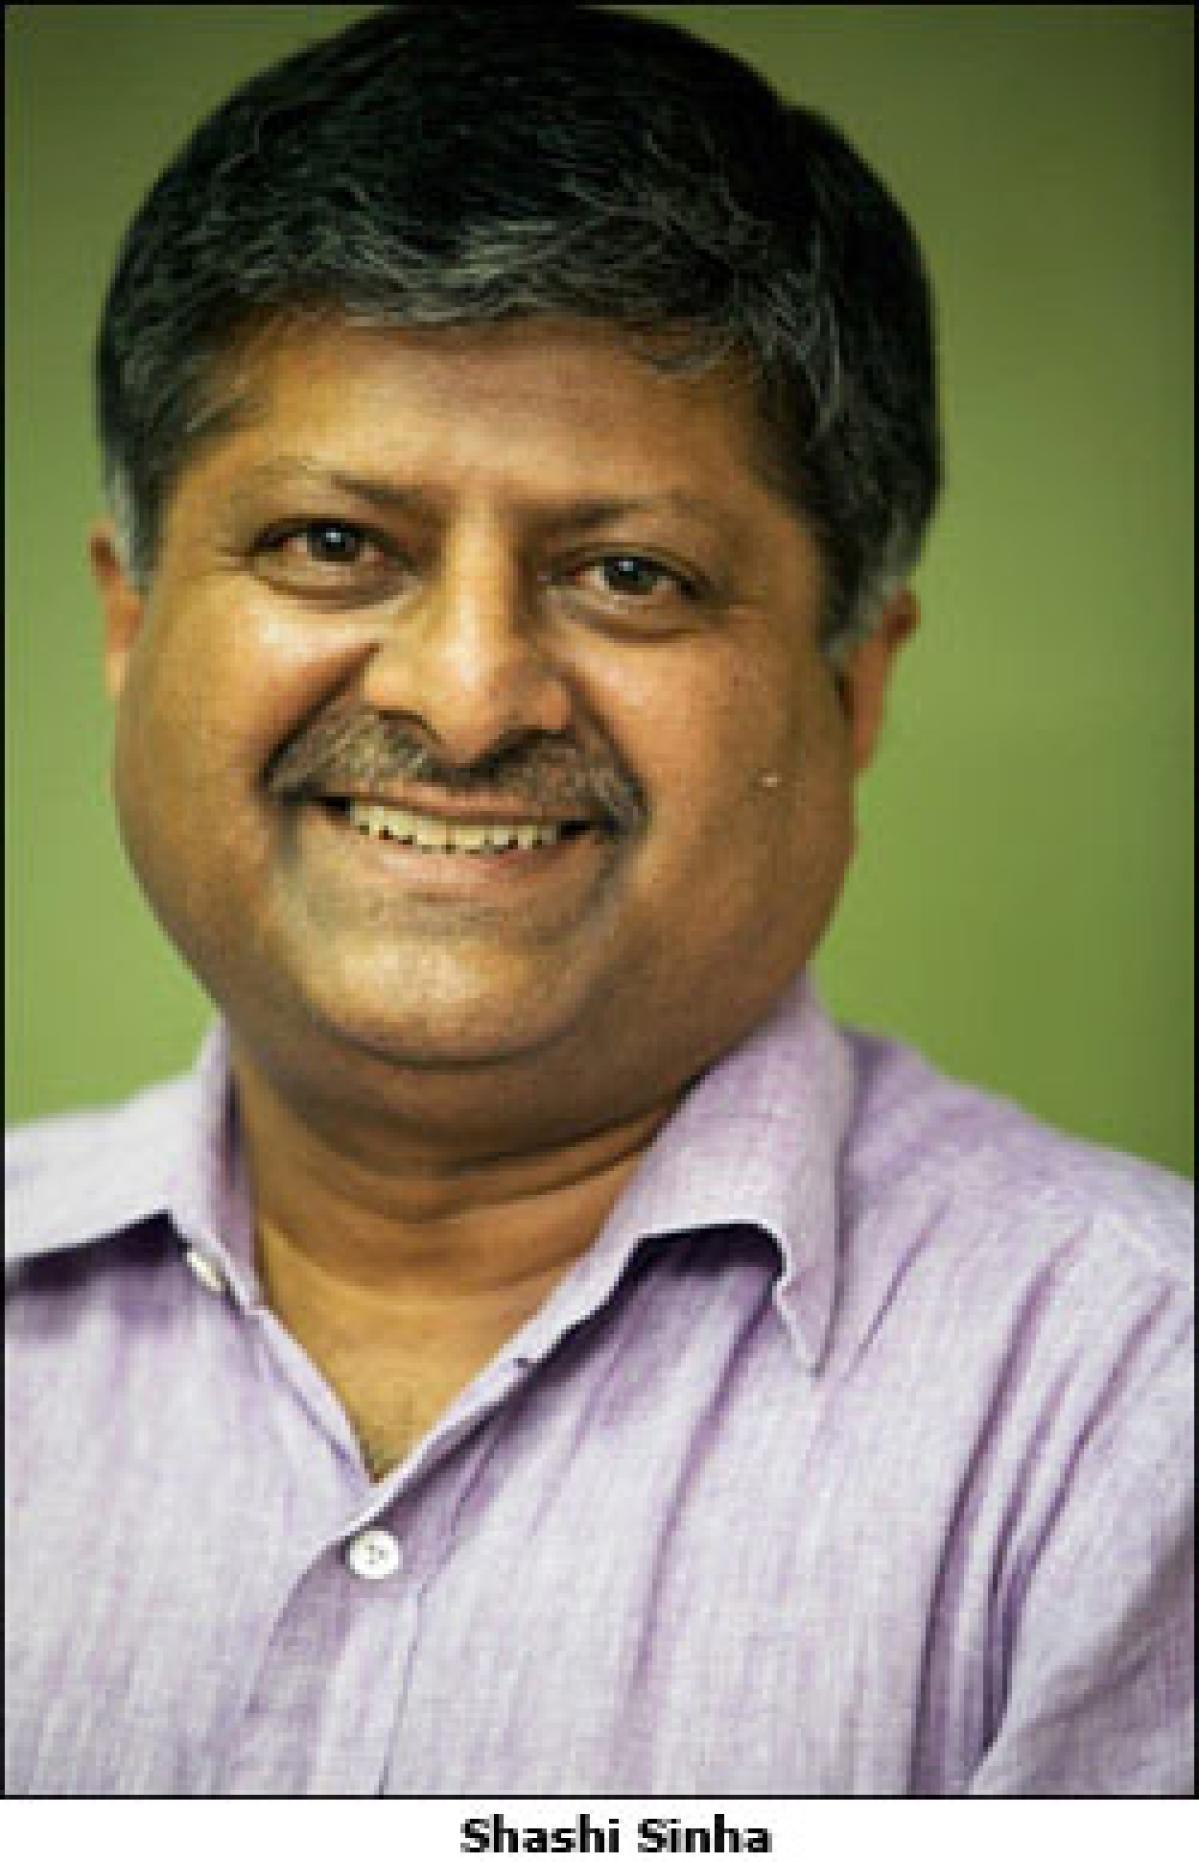 Shashi Sinha is the IPG Mediabrands India CEO; Lynn de Souza quits